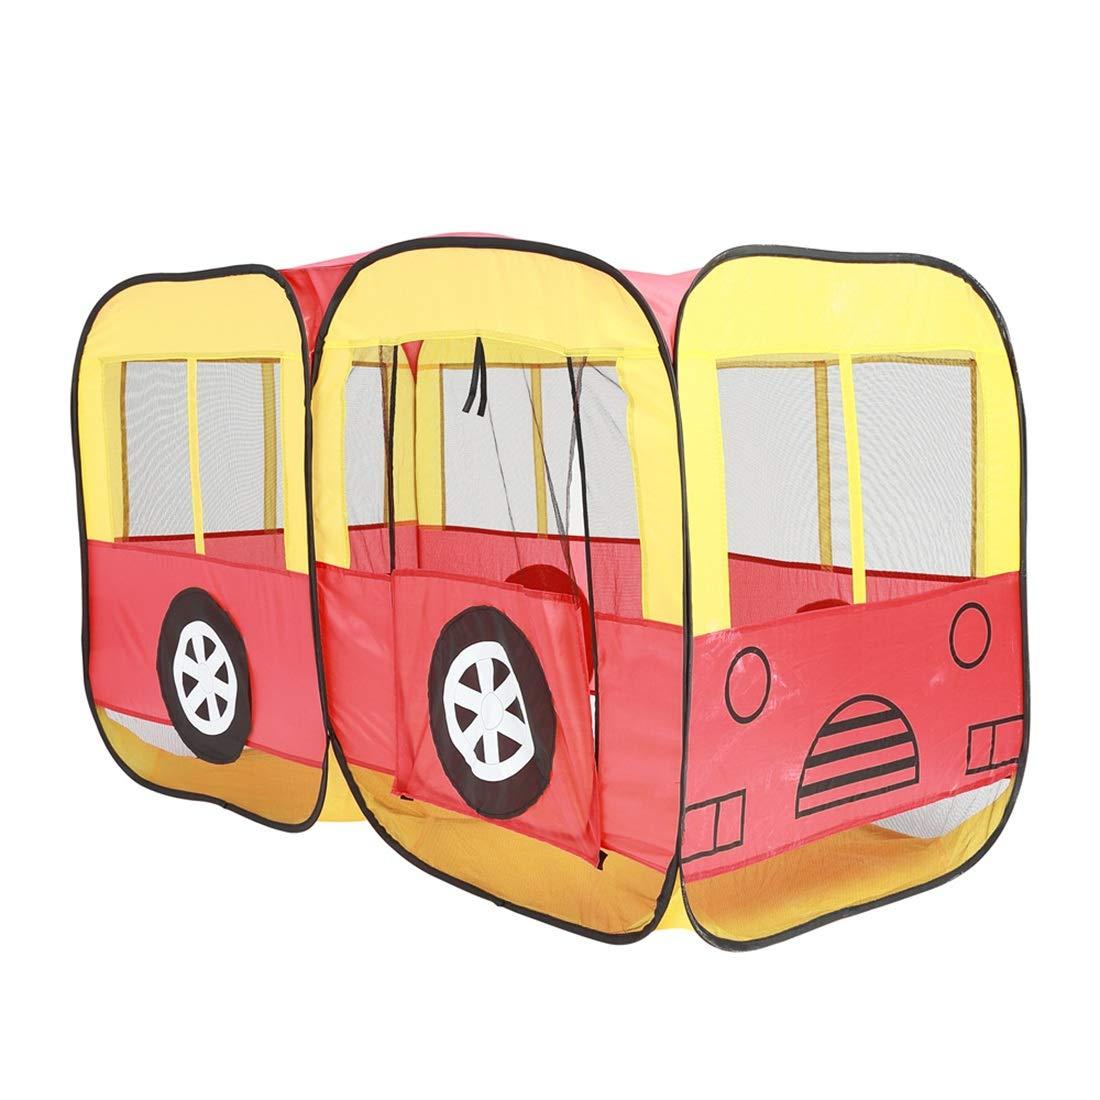 Nekovan イエロー) 子供の子供屋内テントのおもちゃのプレイハウスバスタイプの折りたたみポータブル Nekovan (色 : B07R4FDBPT イエロー) イエロー B07R4FDBPT, こだわり食材マーケット:efb0d9c0 --- number-directory.top